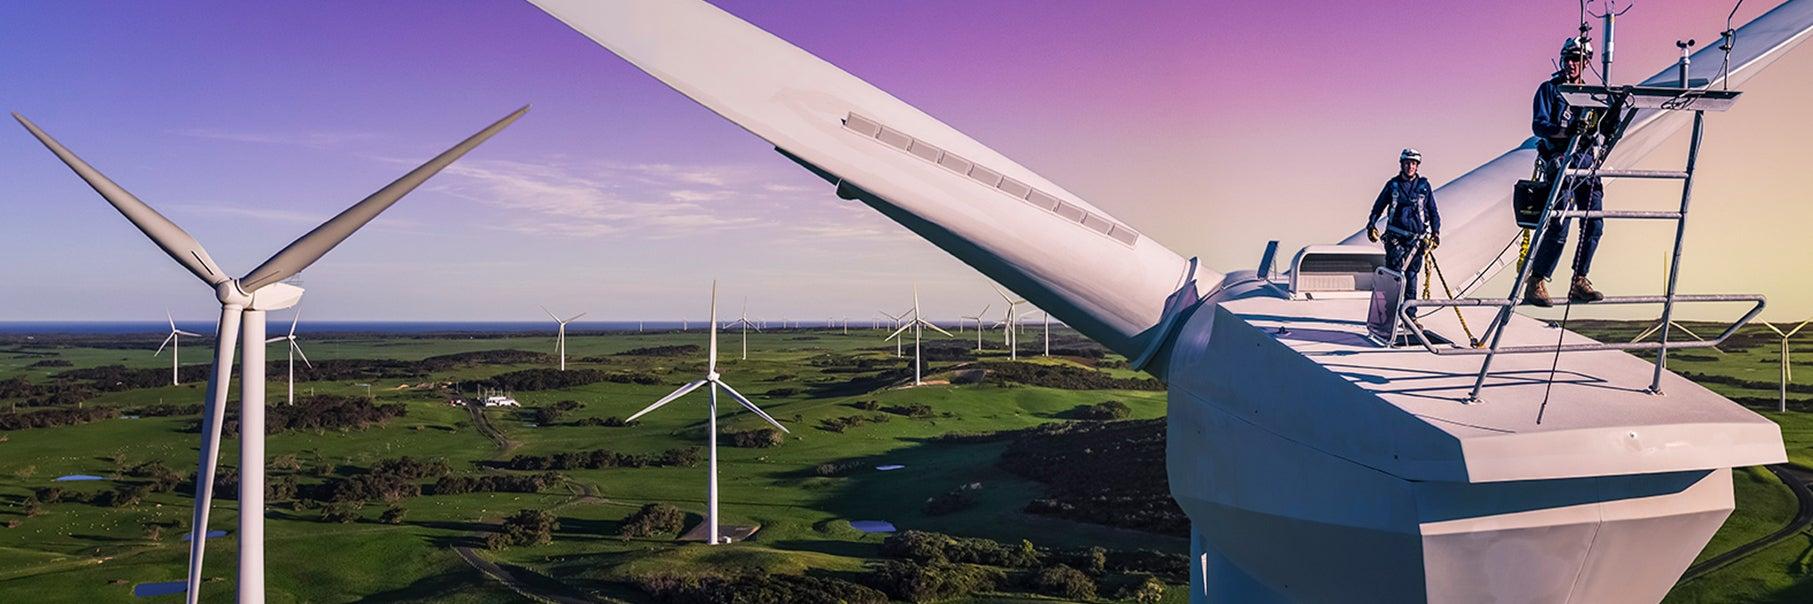 Two men standing on a renewable energy generator